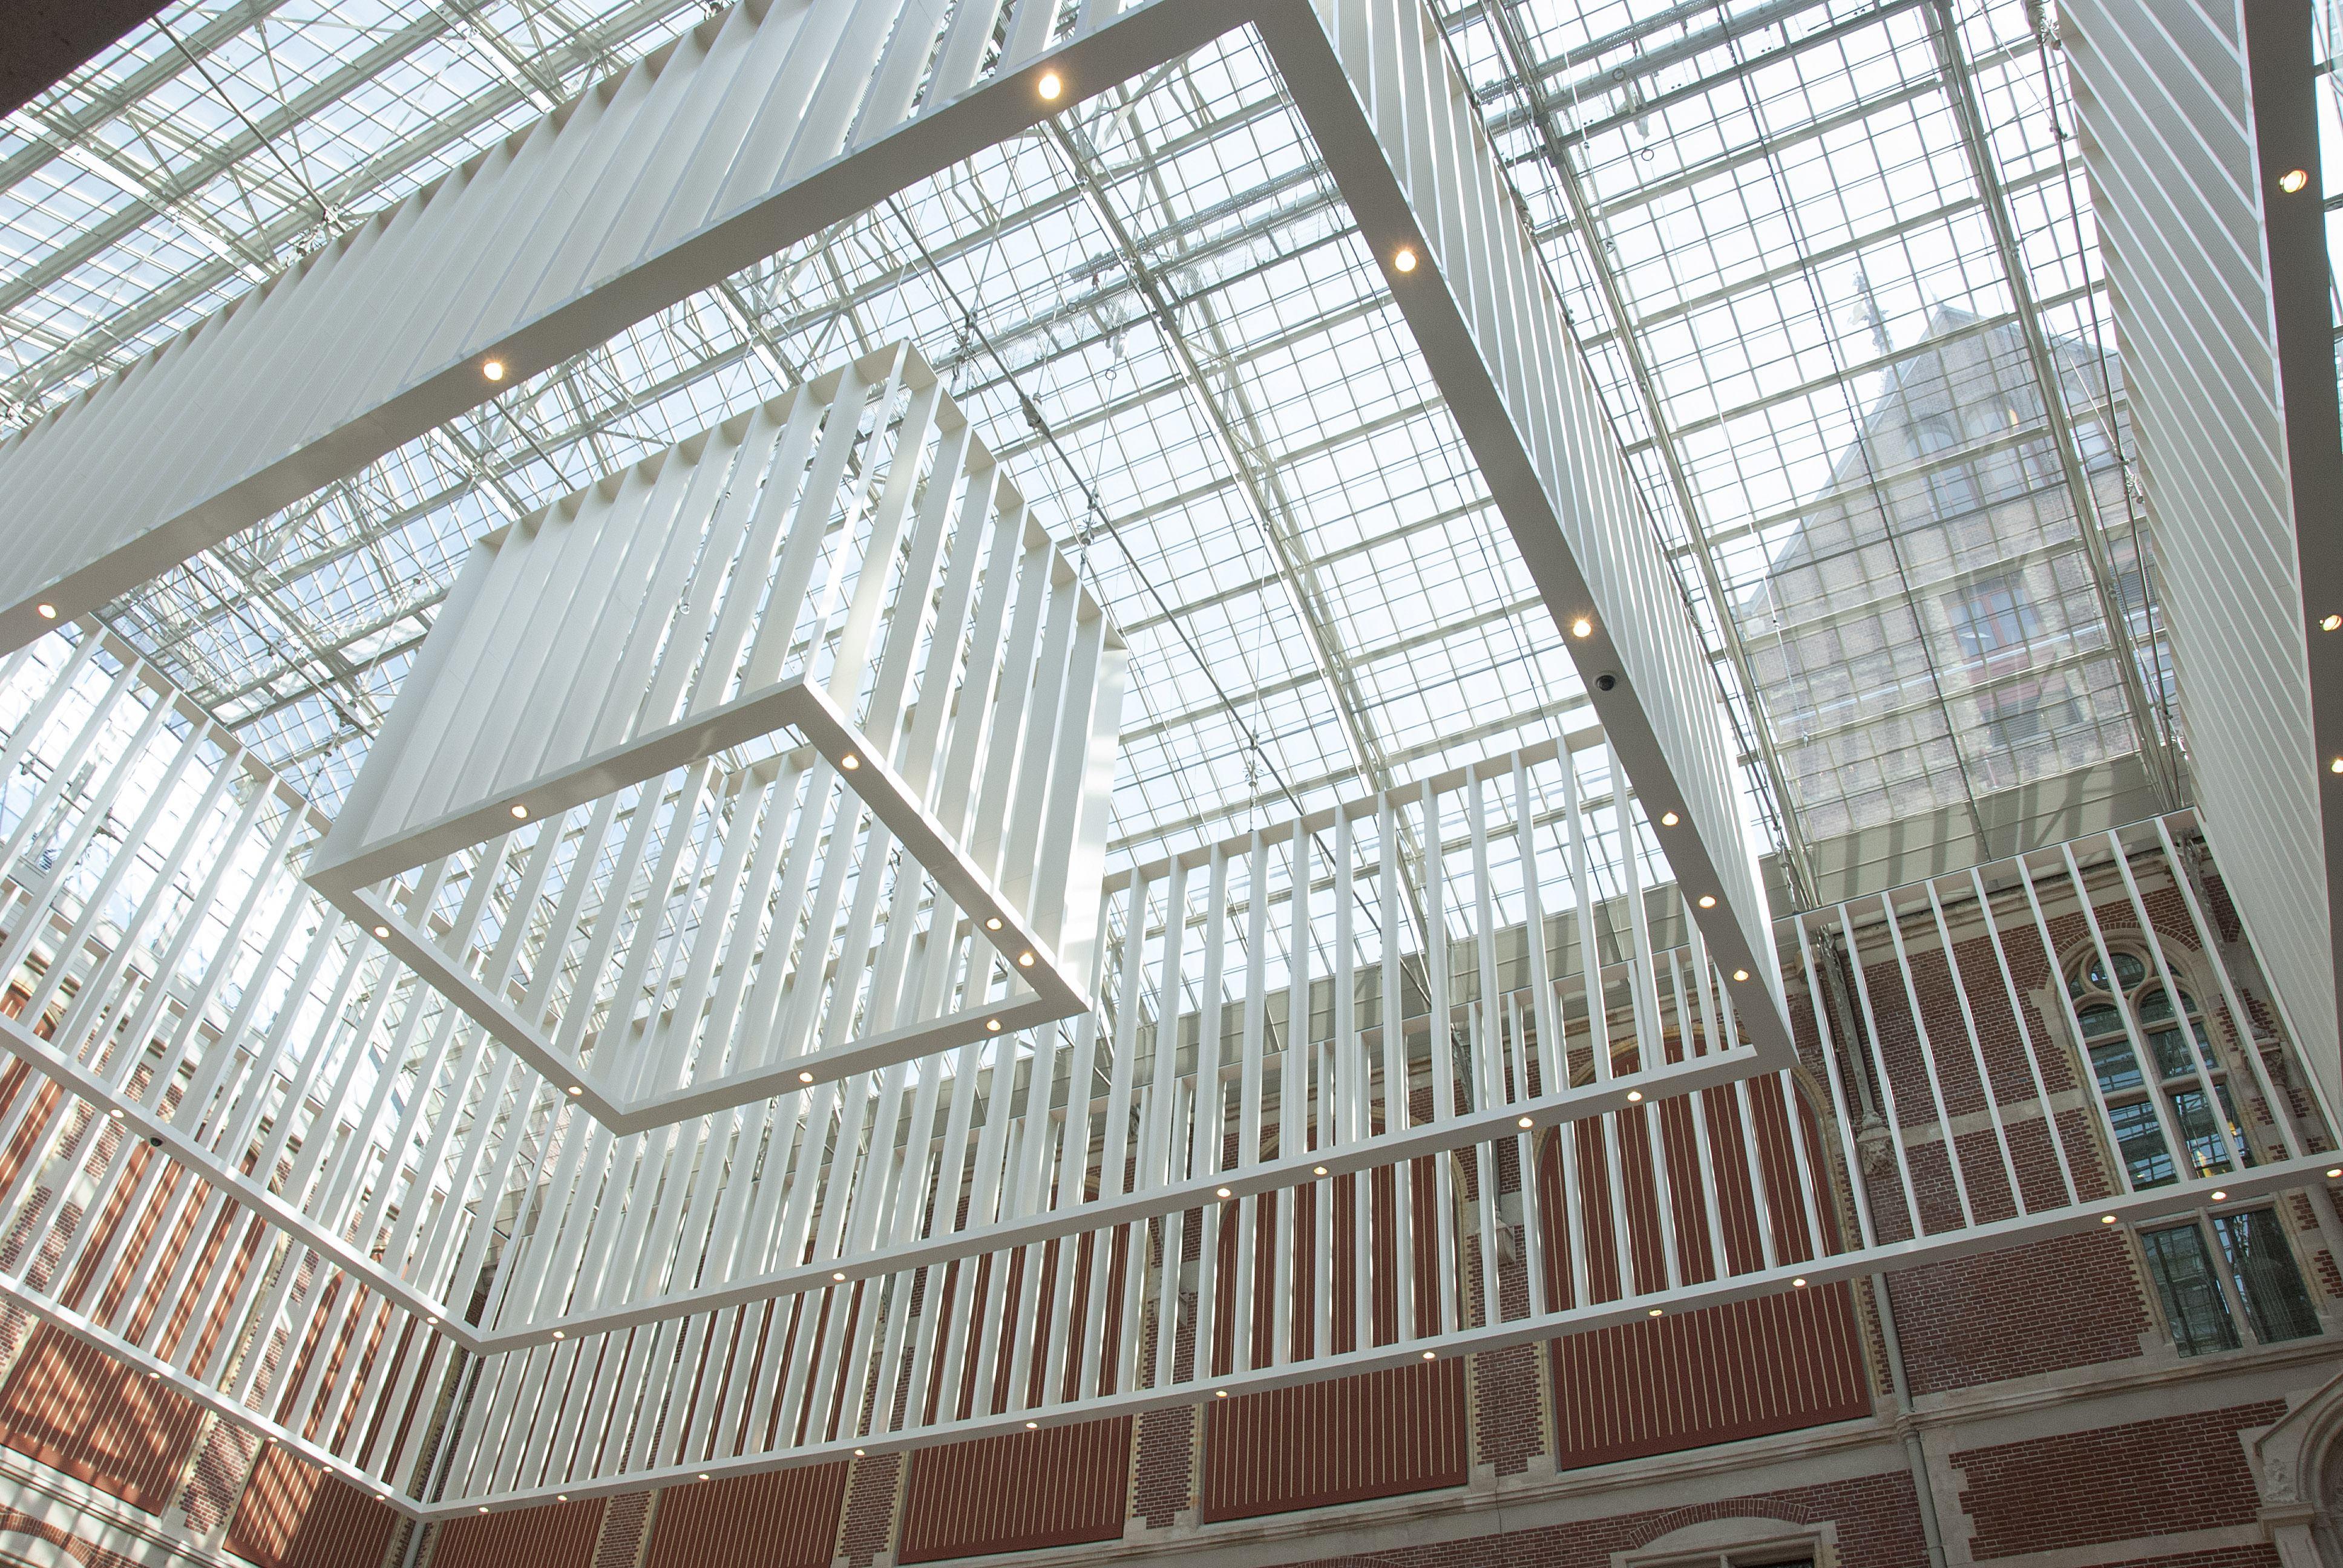 Rijksmuseum (2014)